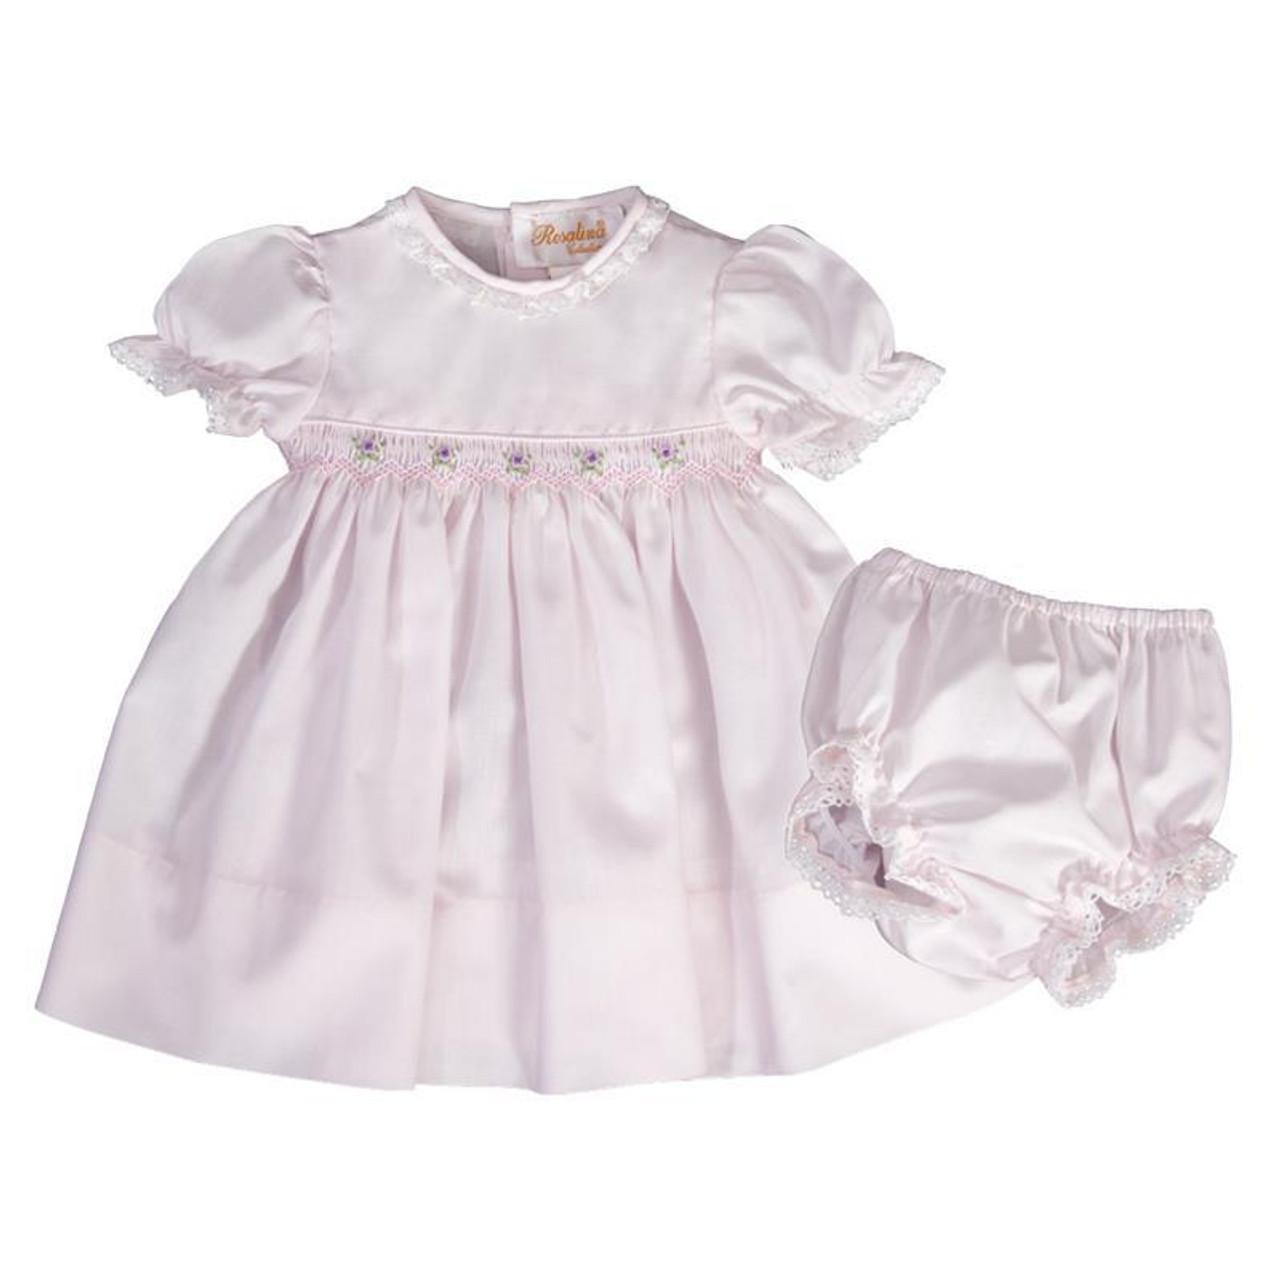 29886d90b0af Aria Light Pink English Smocked Baby Dress with Eyelet Bloomer ...